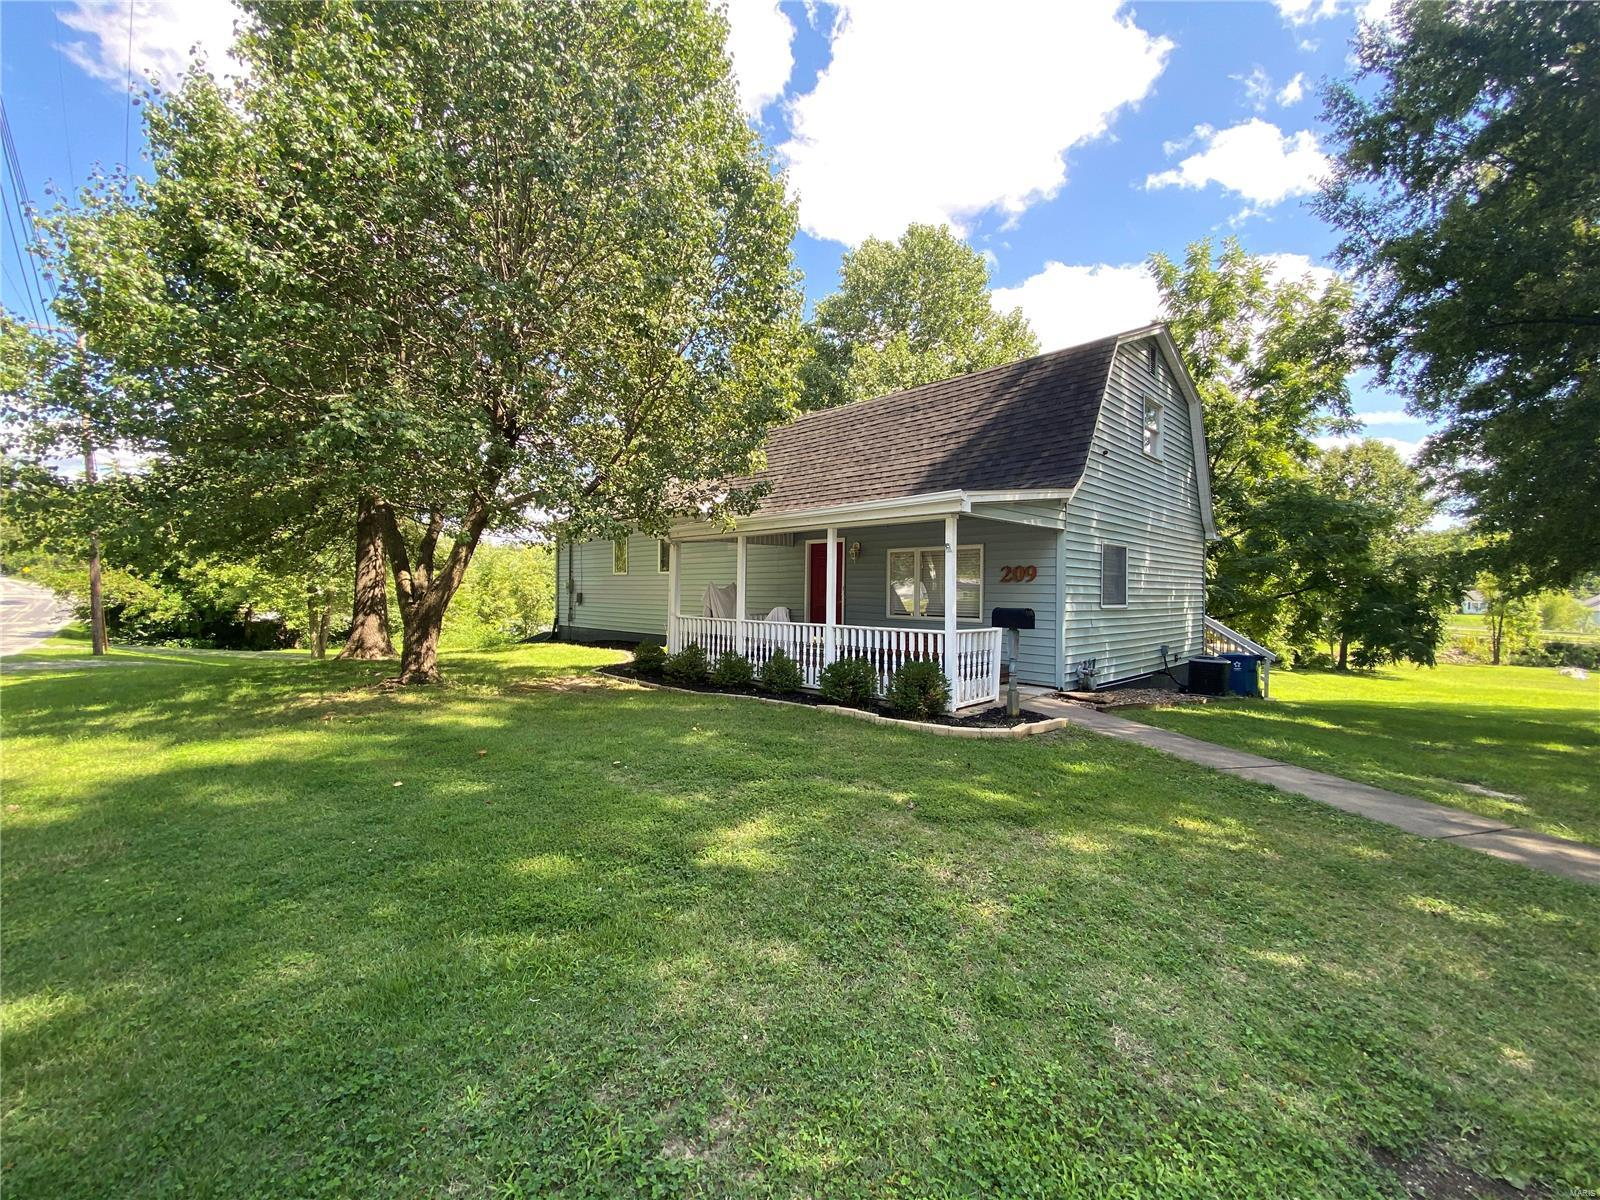 209 Prentice Property Photo - Carterville, IL real estate listing